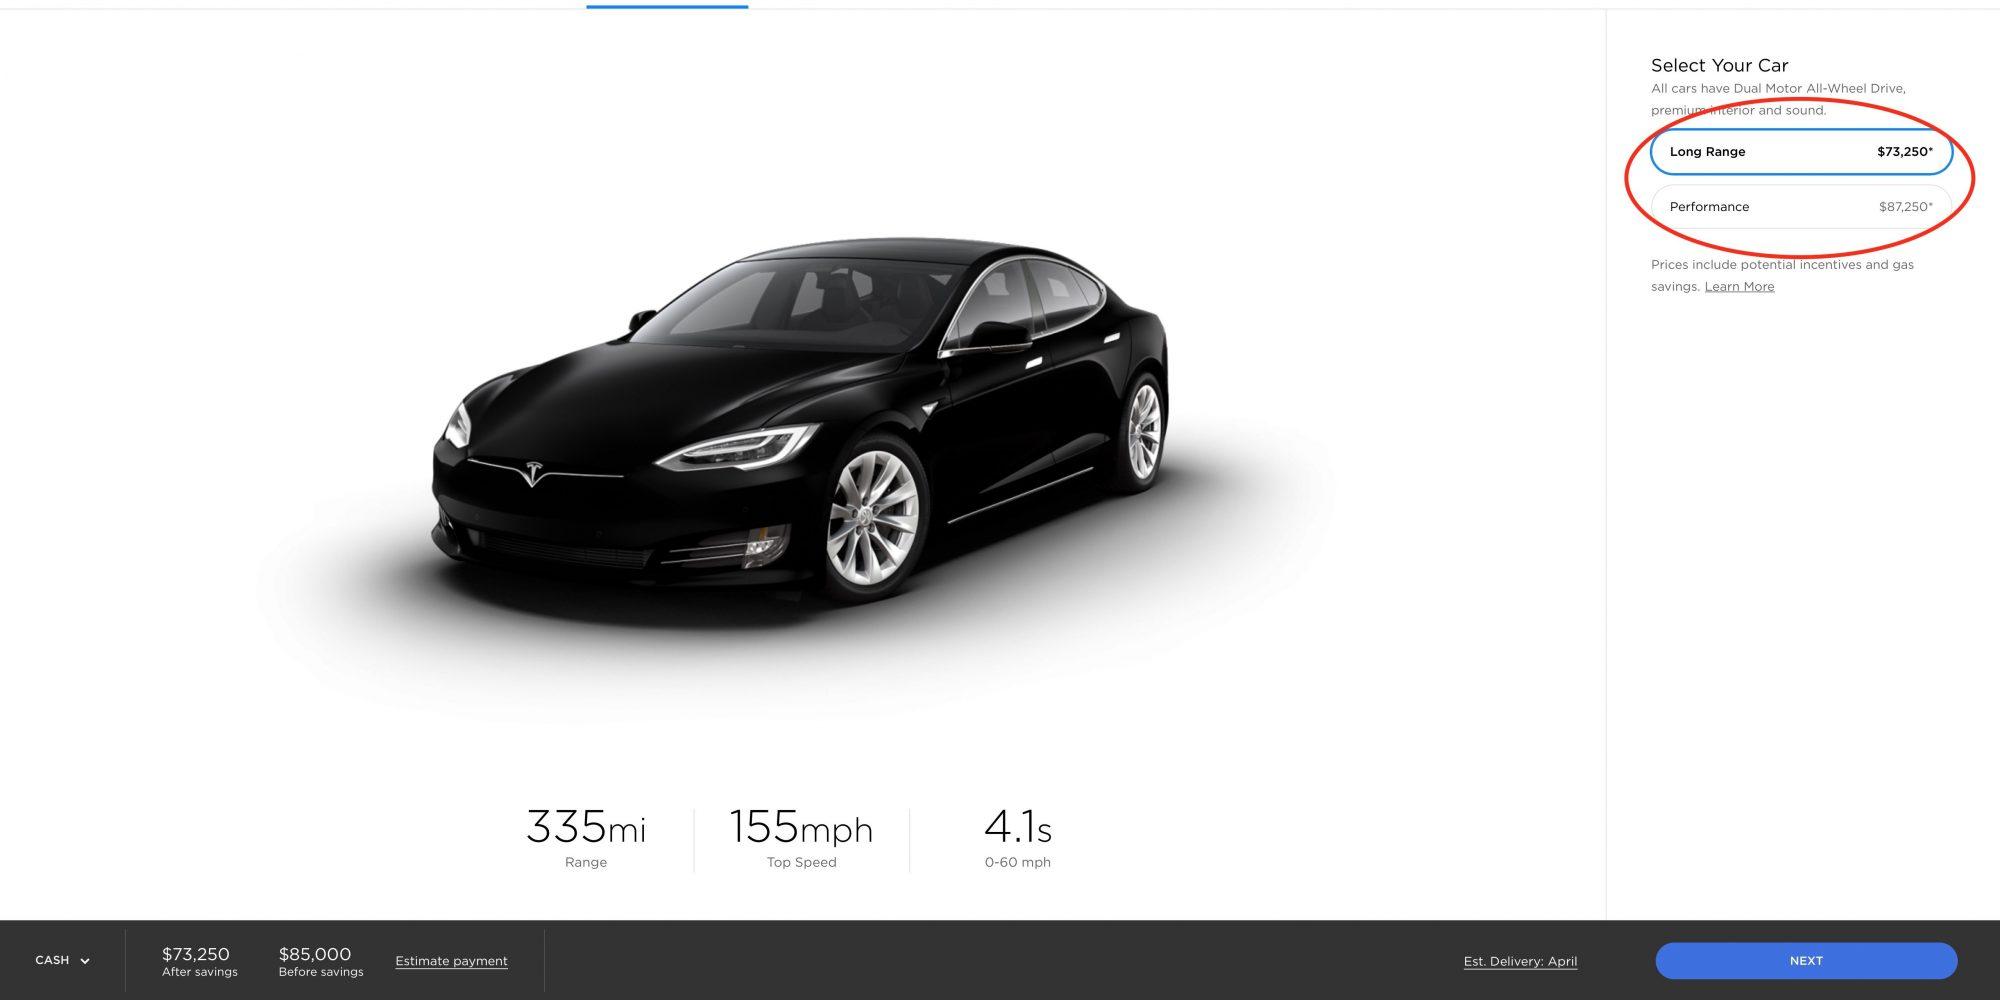 Tesla drops 'standard range' Model S from lineup after just 3 weeks